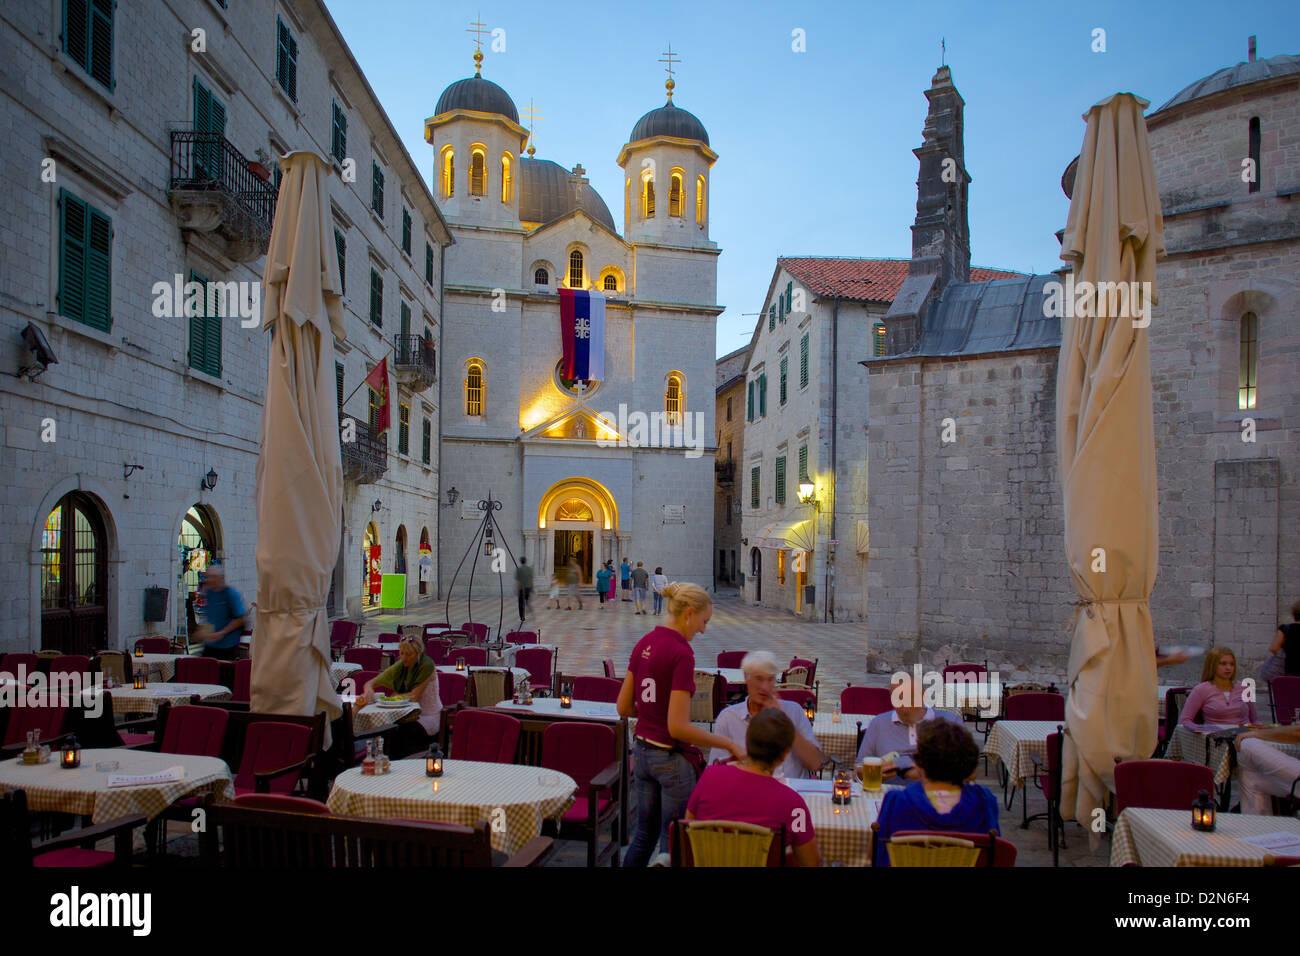 St. Nicholas Serbian Orthodox Church at dusk, Old Town, UNESCO World Heritage Site, Kotor, Montenegro, Europe - Stock Image